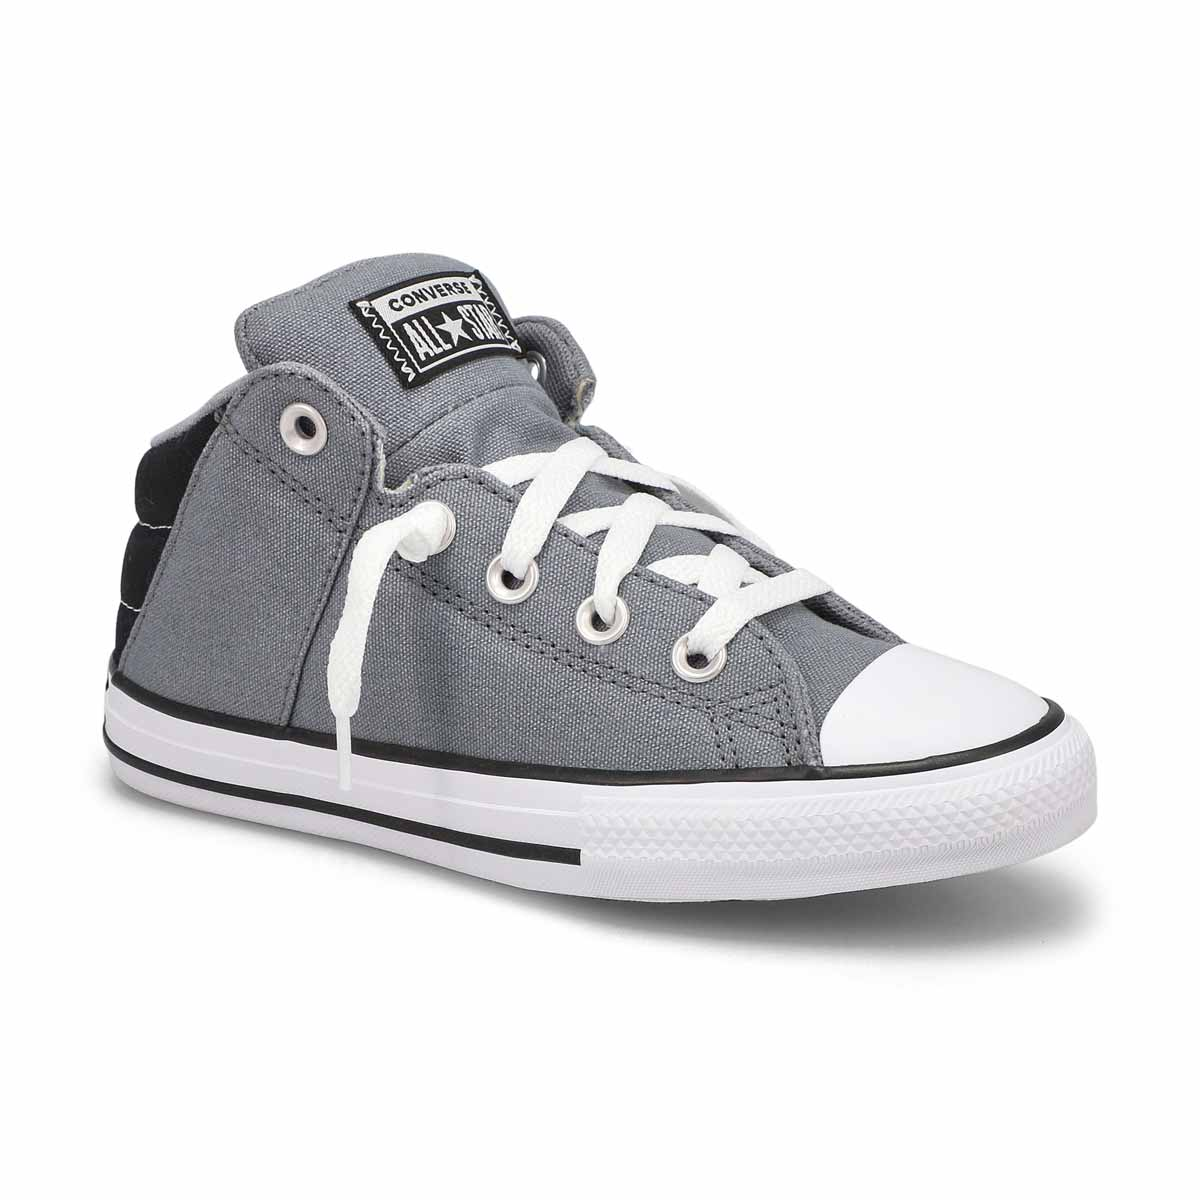 Boys' Chuck Taylor All Star Axel Sneaker- Gry Muti